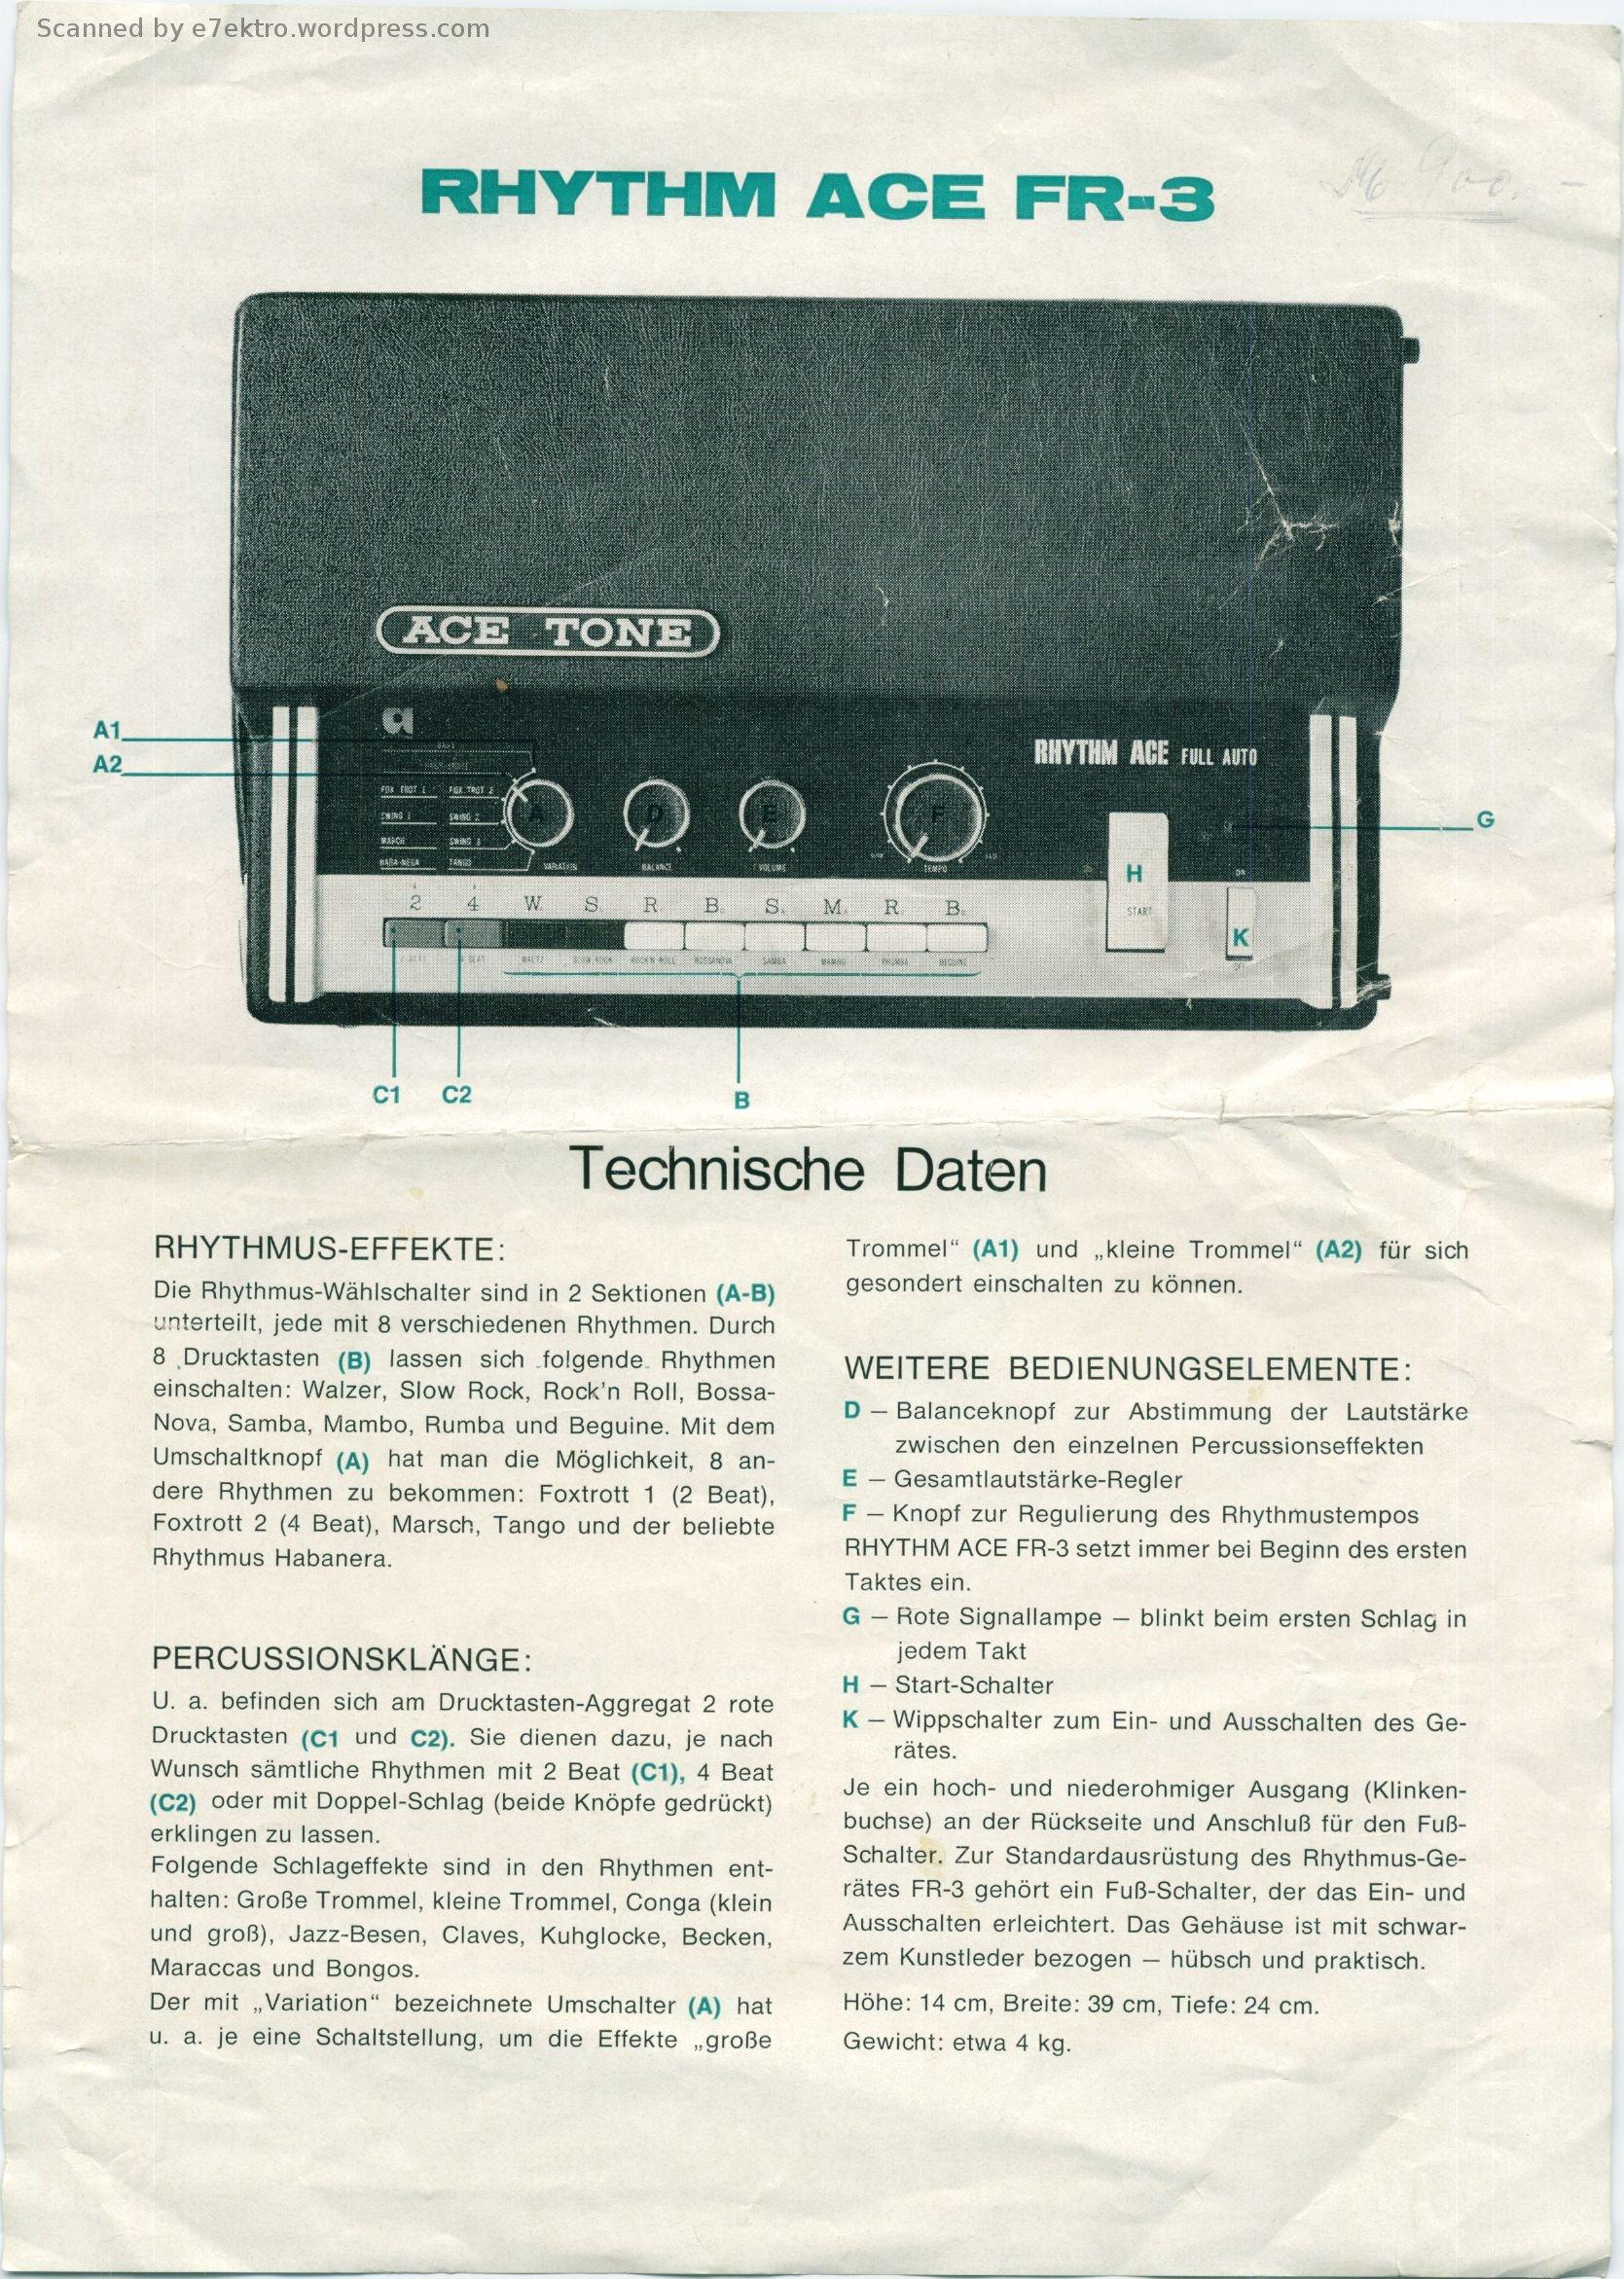 Elektronische Schaltkreise | e7ektroblog